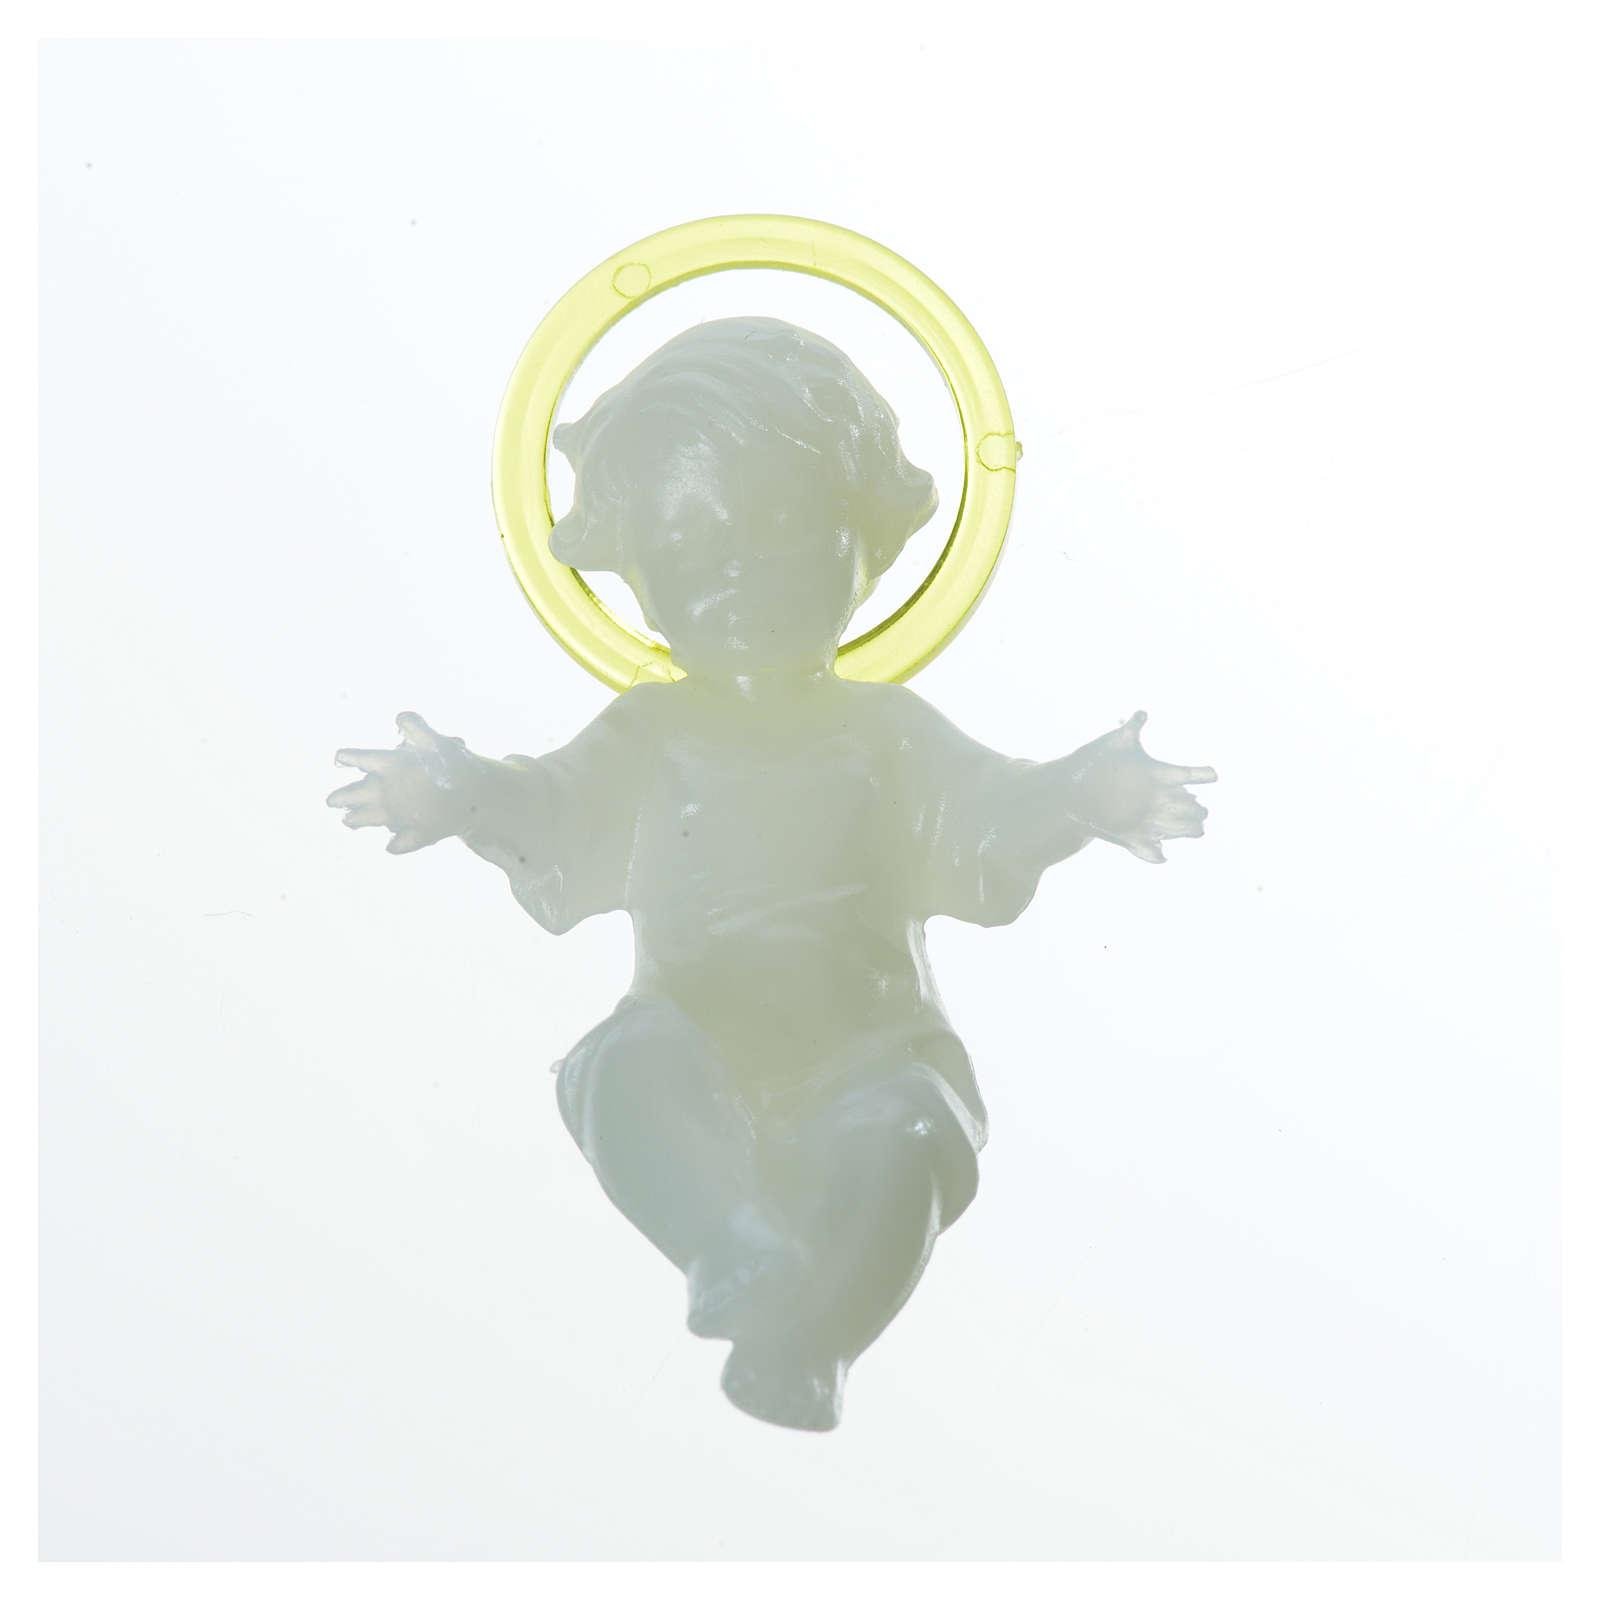 Niño Jesús fosforescente 5 cm plástico 3